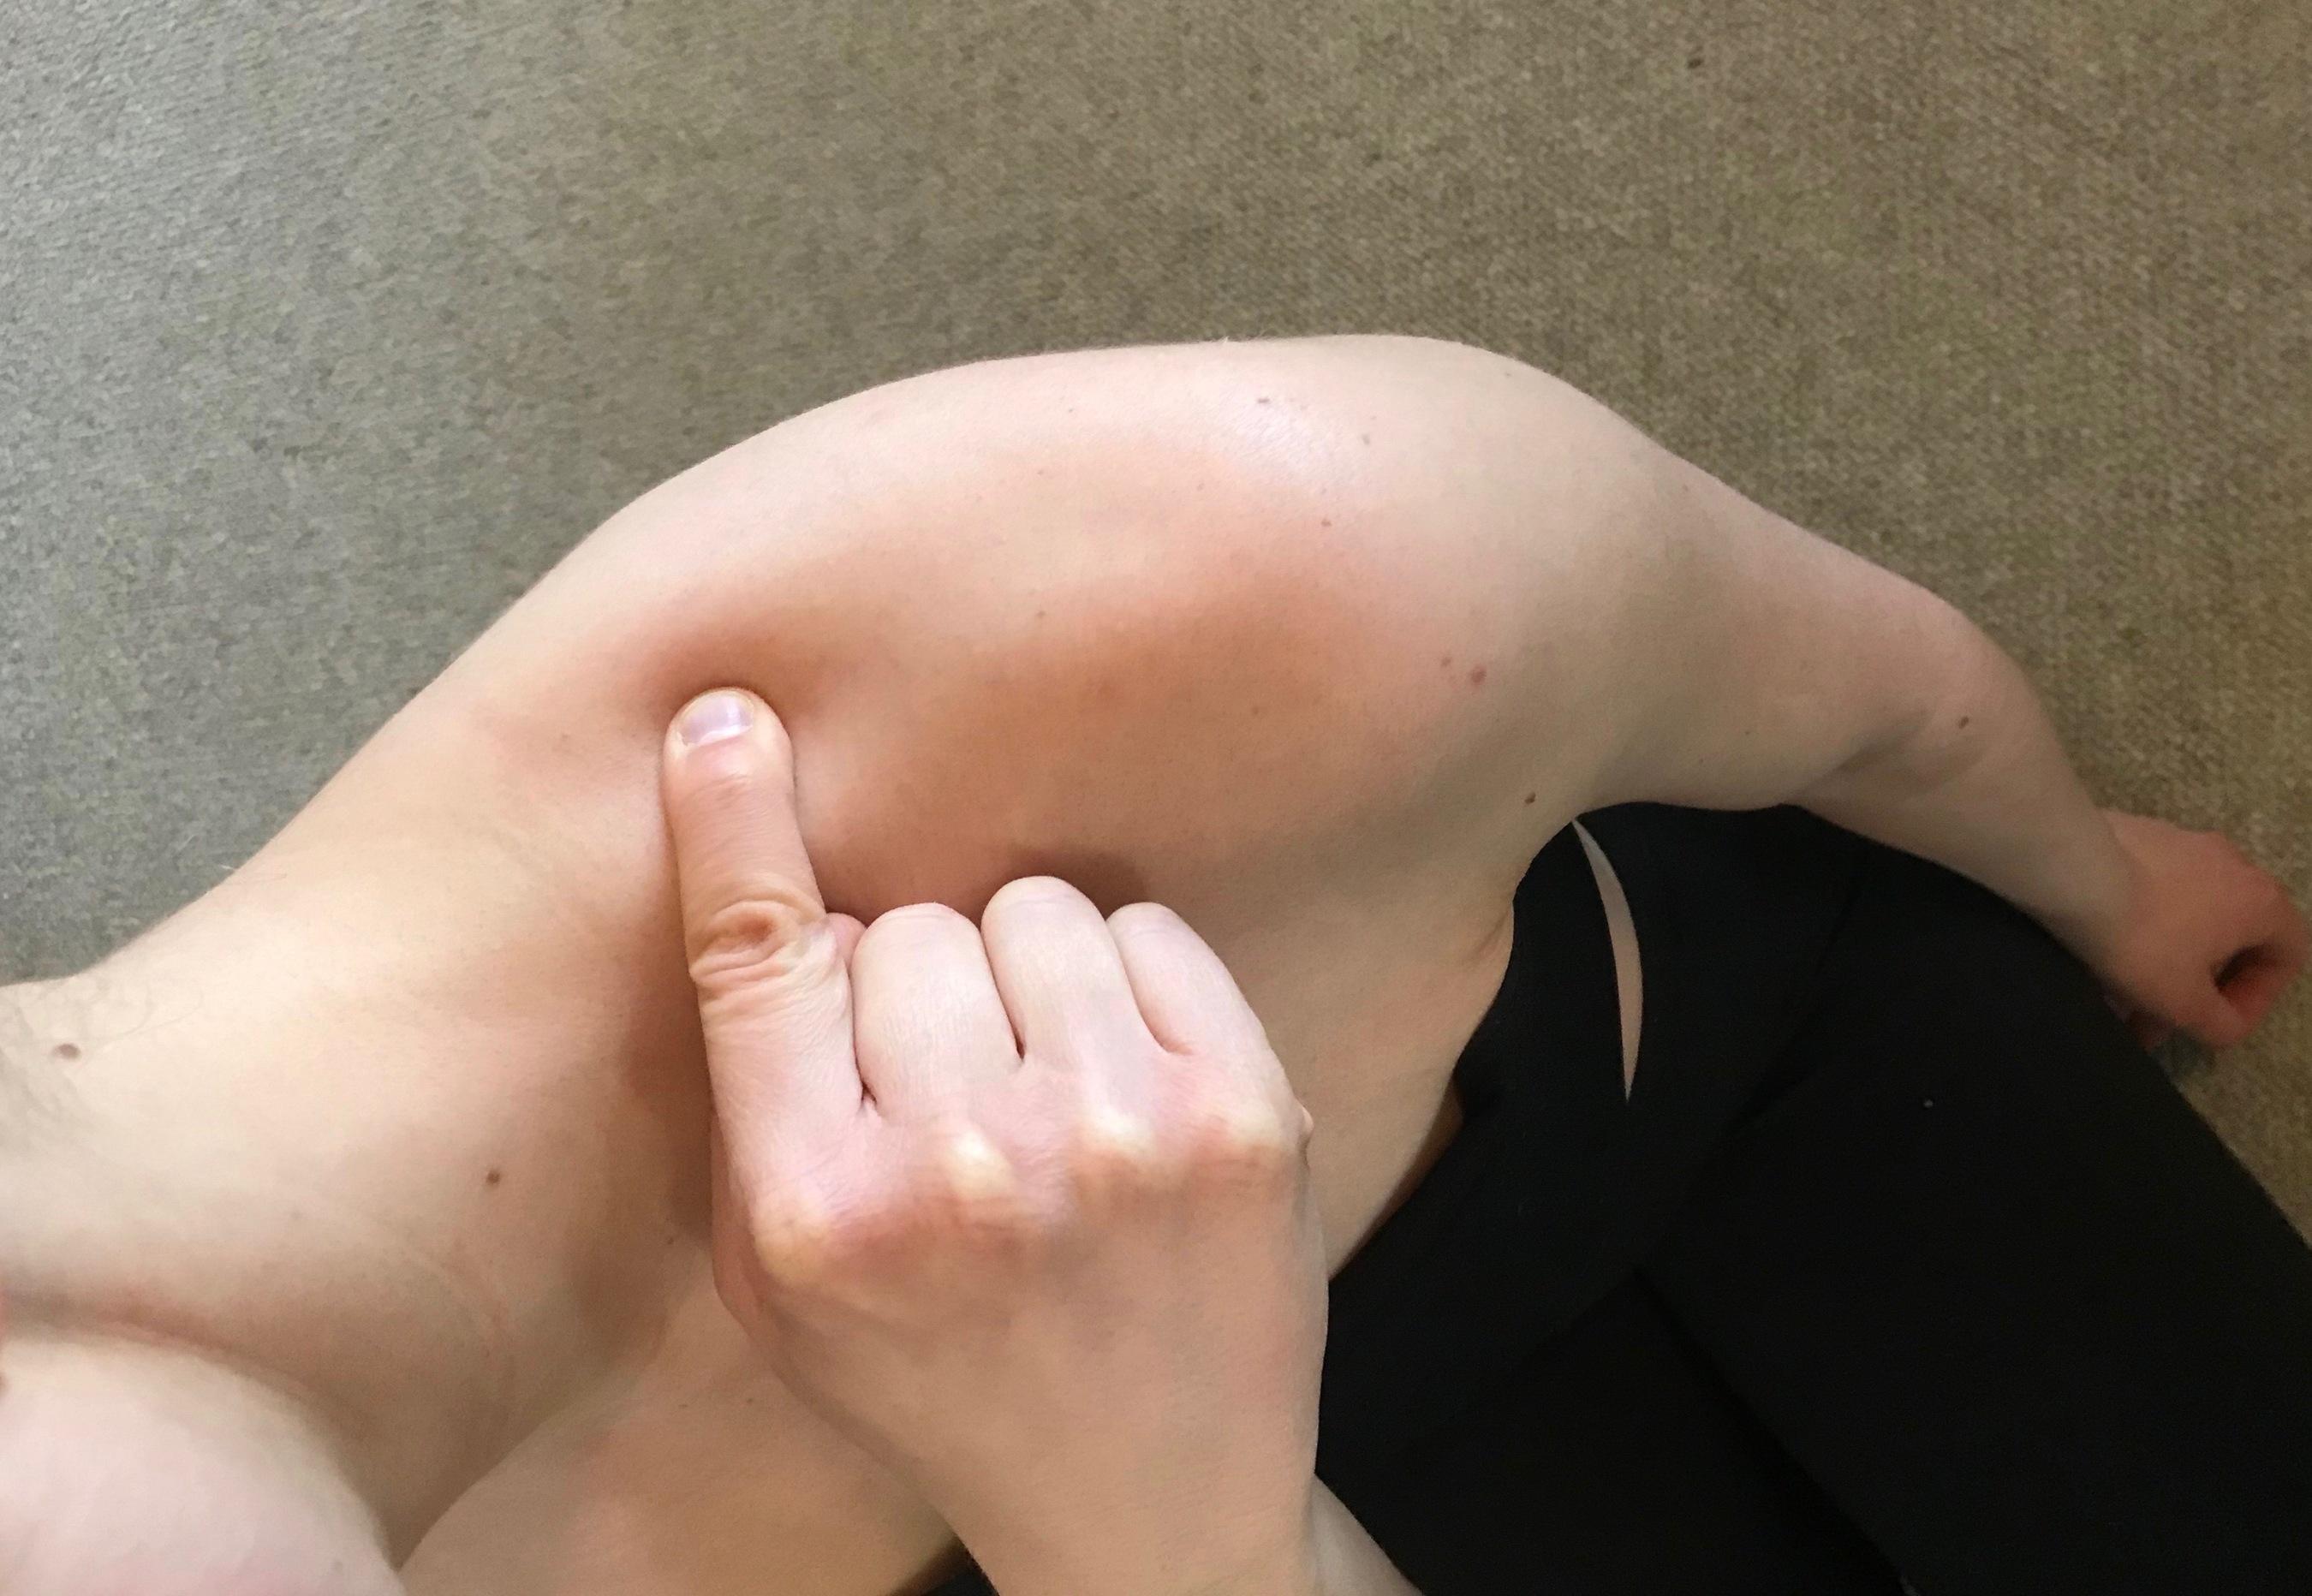 Pointing to Gallbladder 21